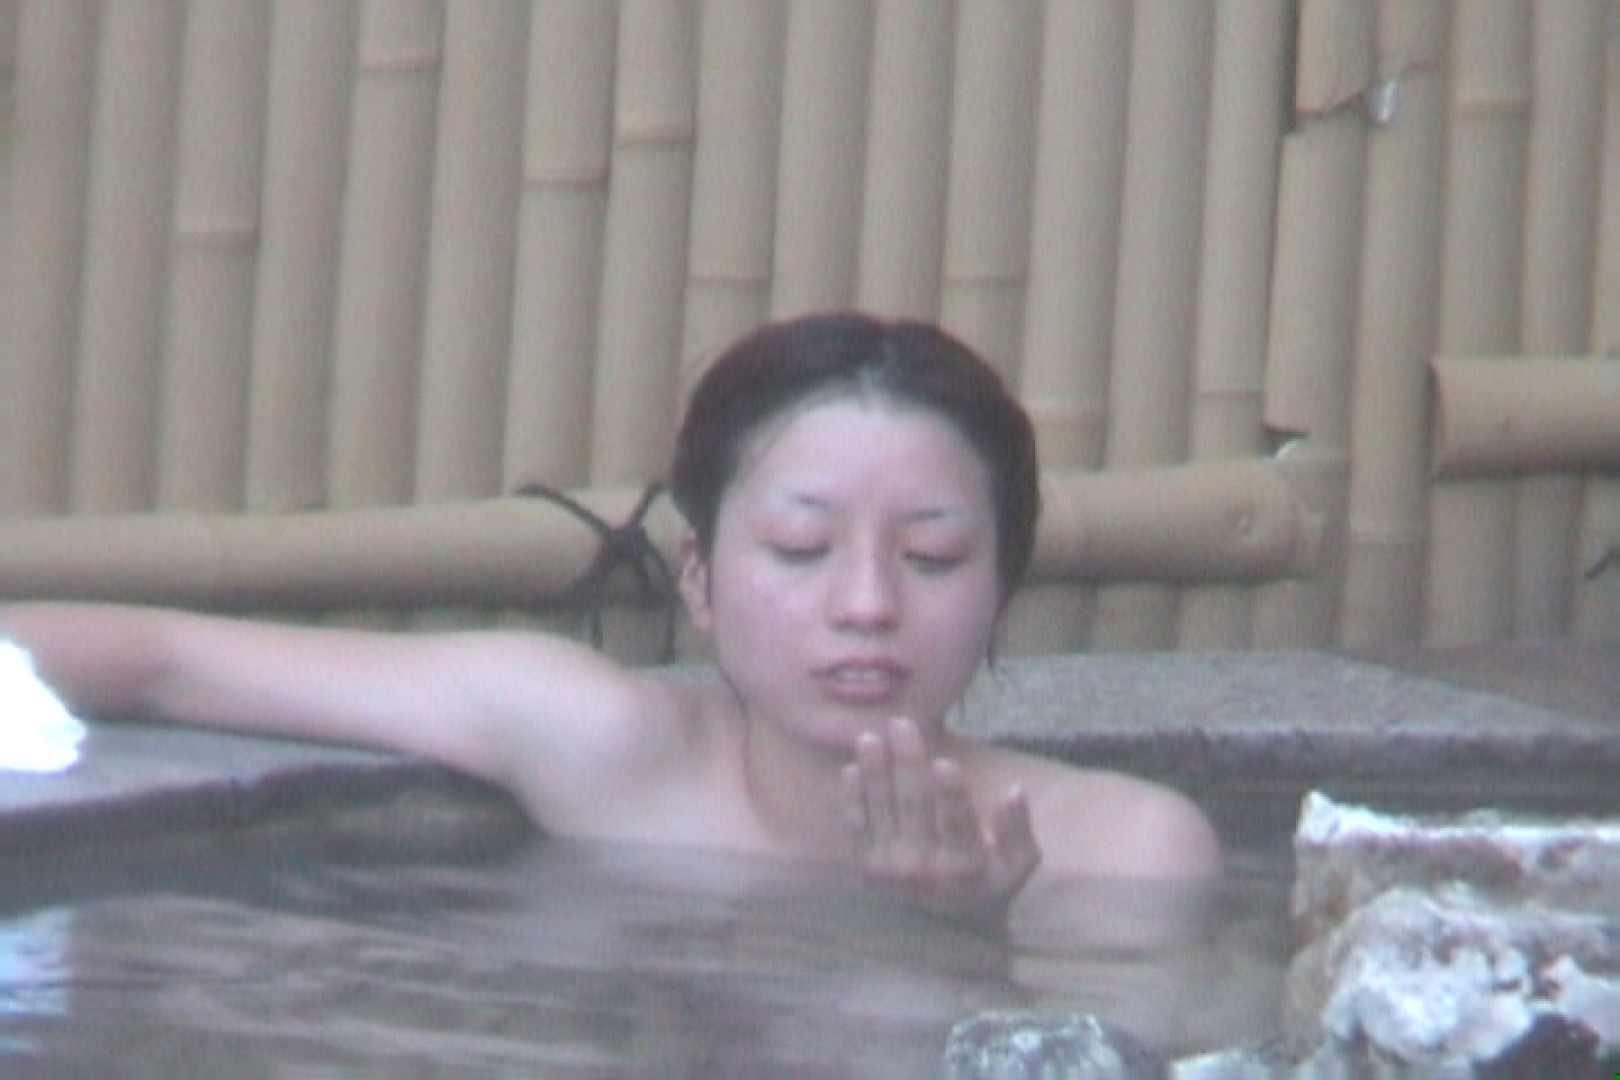 Aquaな露天風呂Vol.608 HなOL | 盗撮  89pic 71